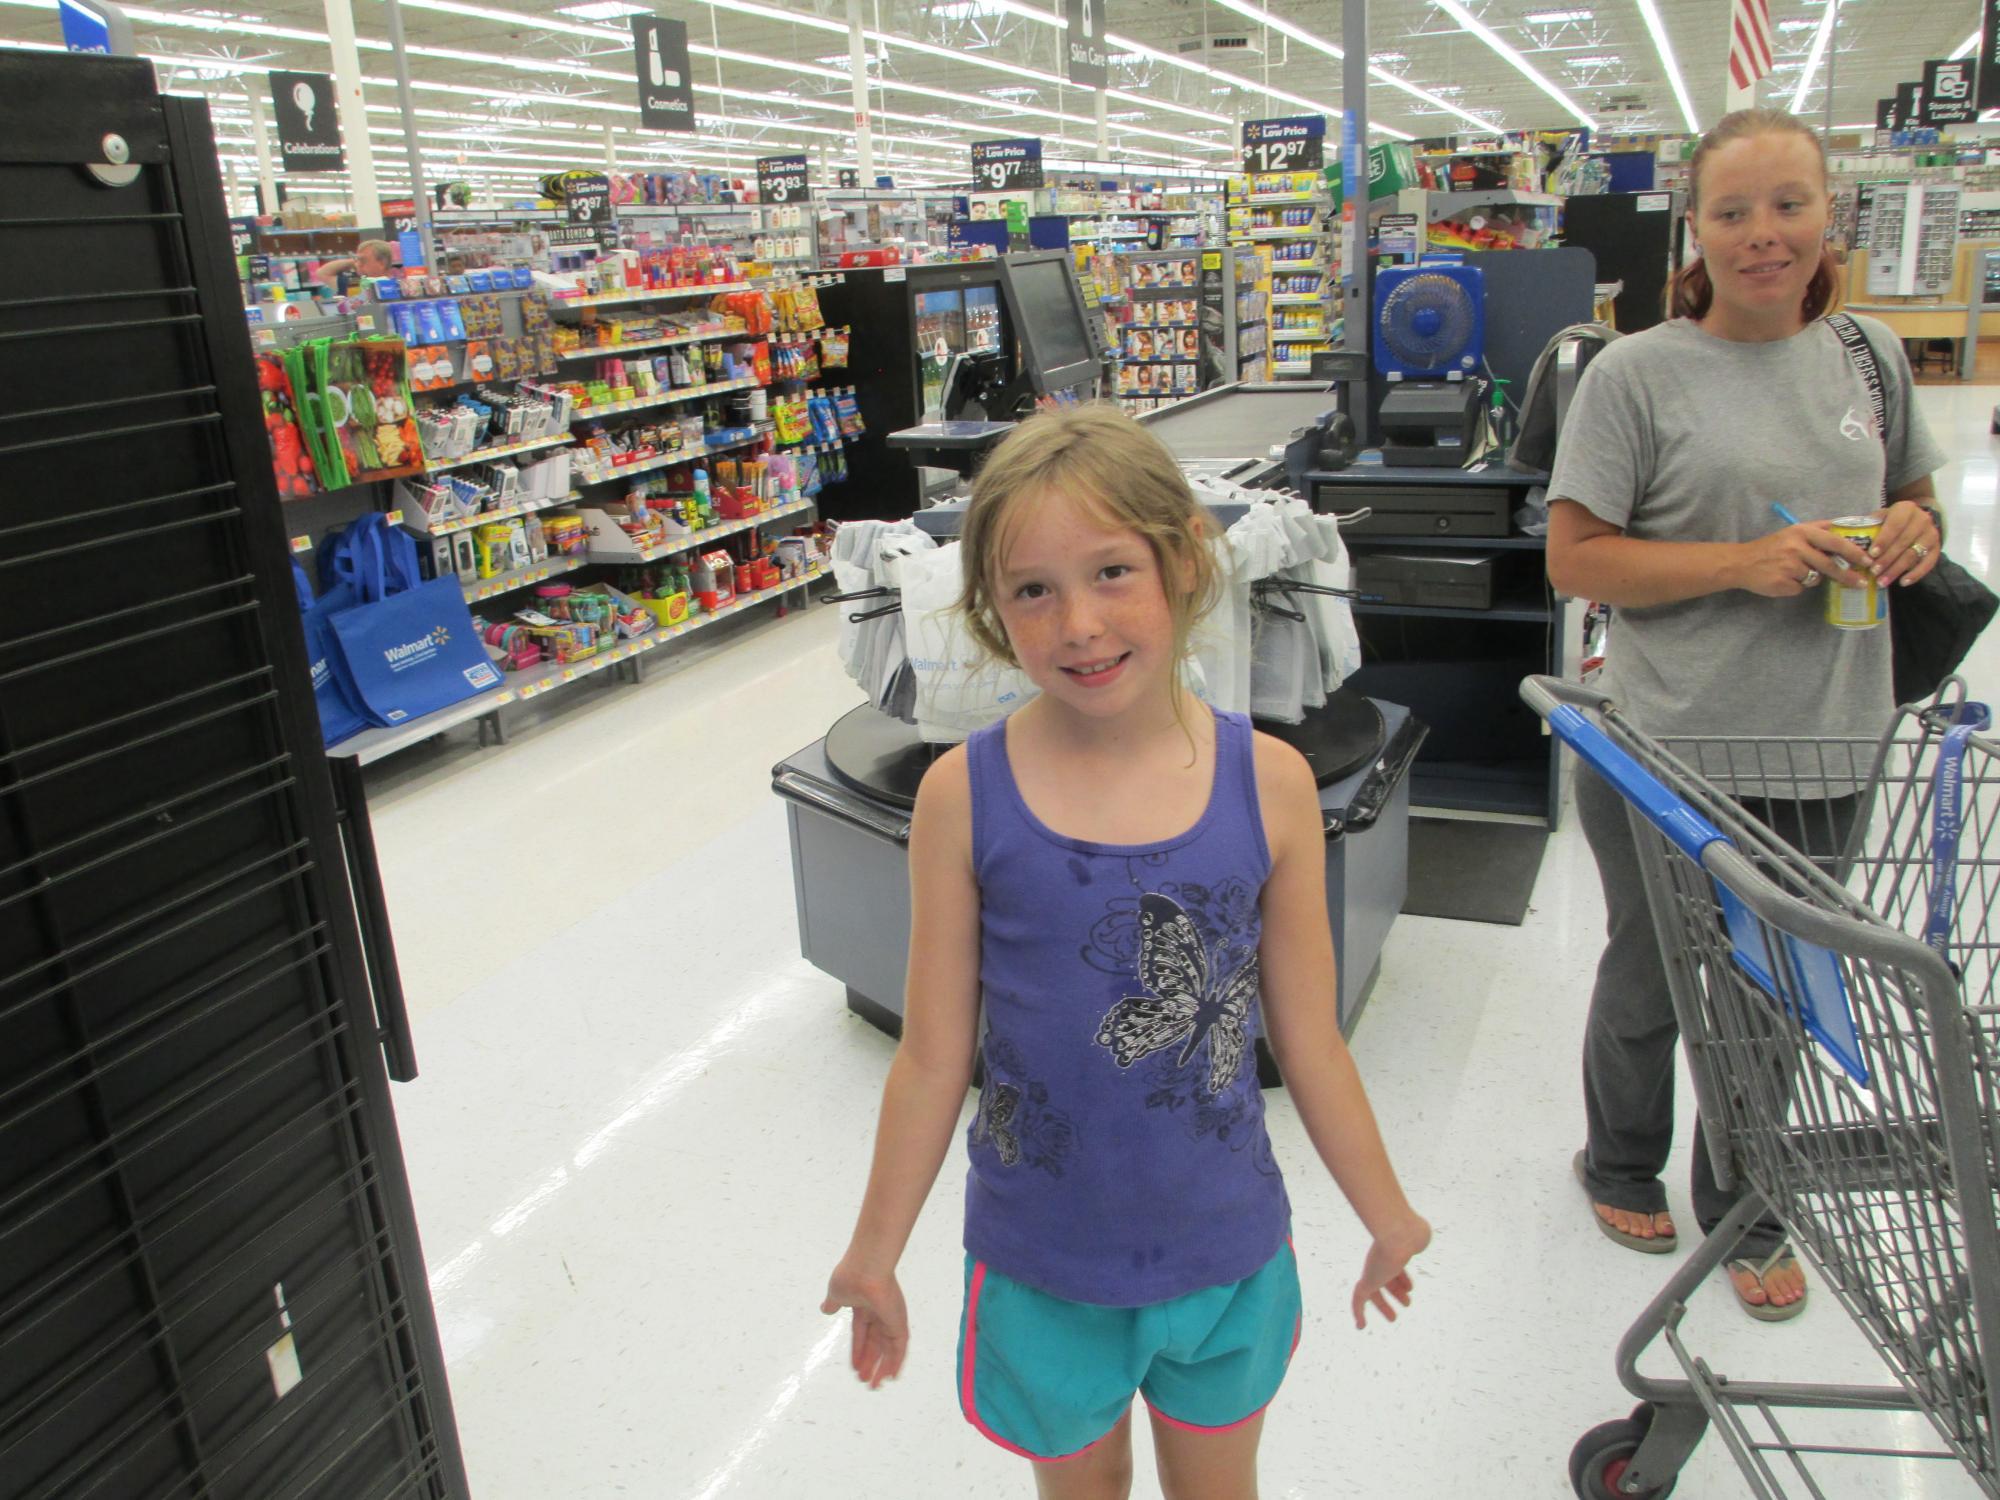 2018 july 31 back to school shop with law enforcement walmart zebulon rd